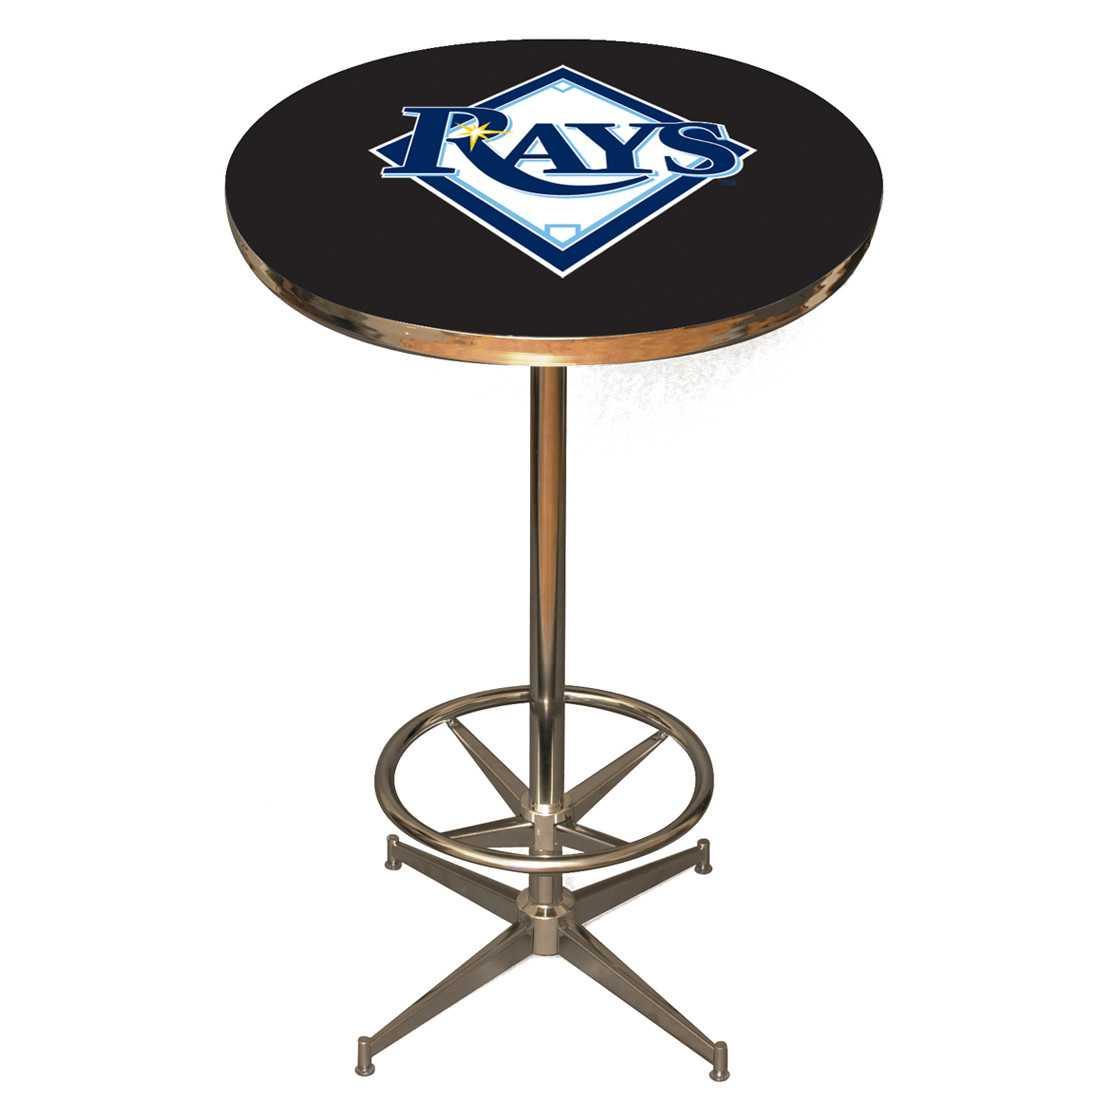 TAMPA BAY DEVIL RAYS PUB TABLE